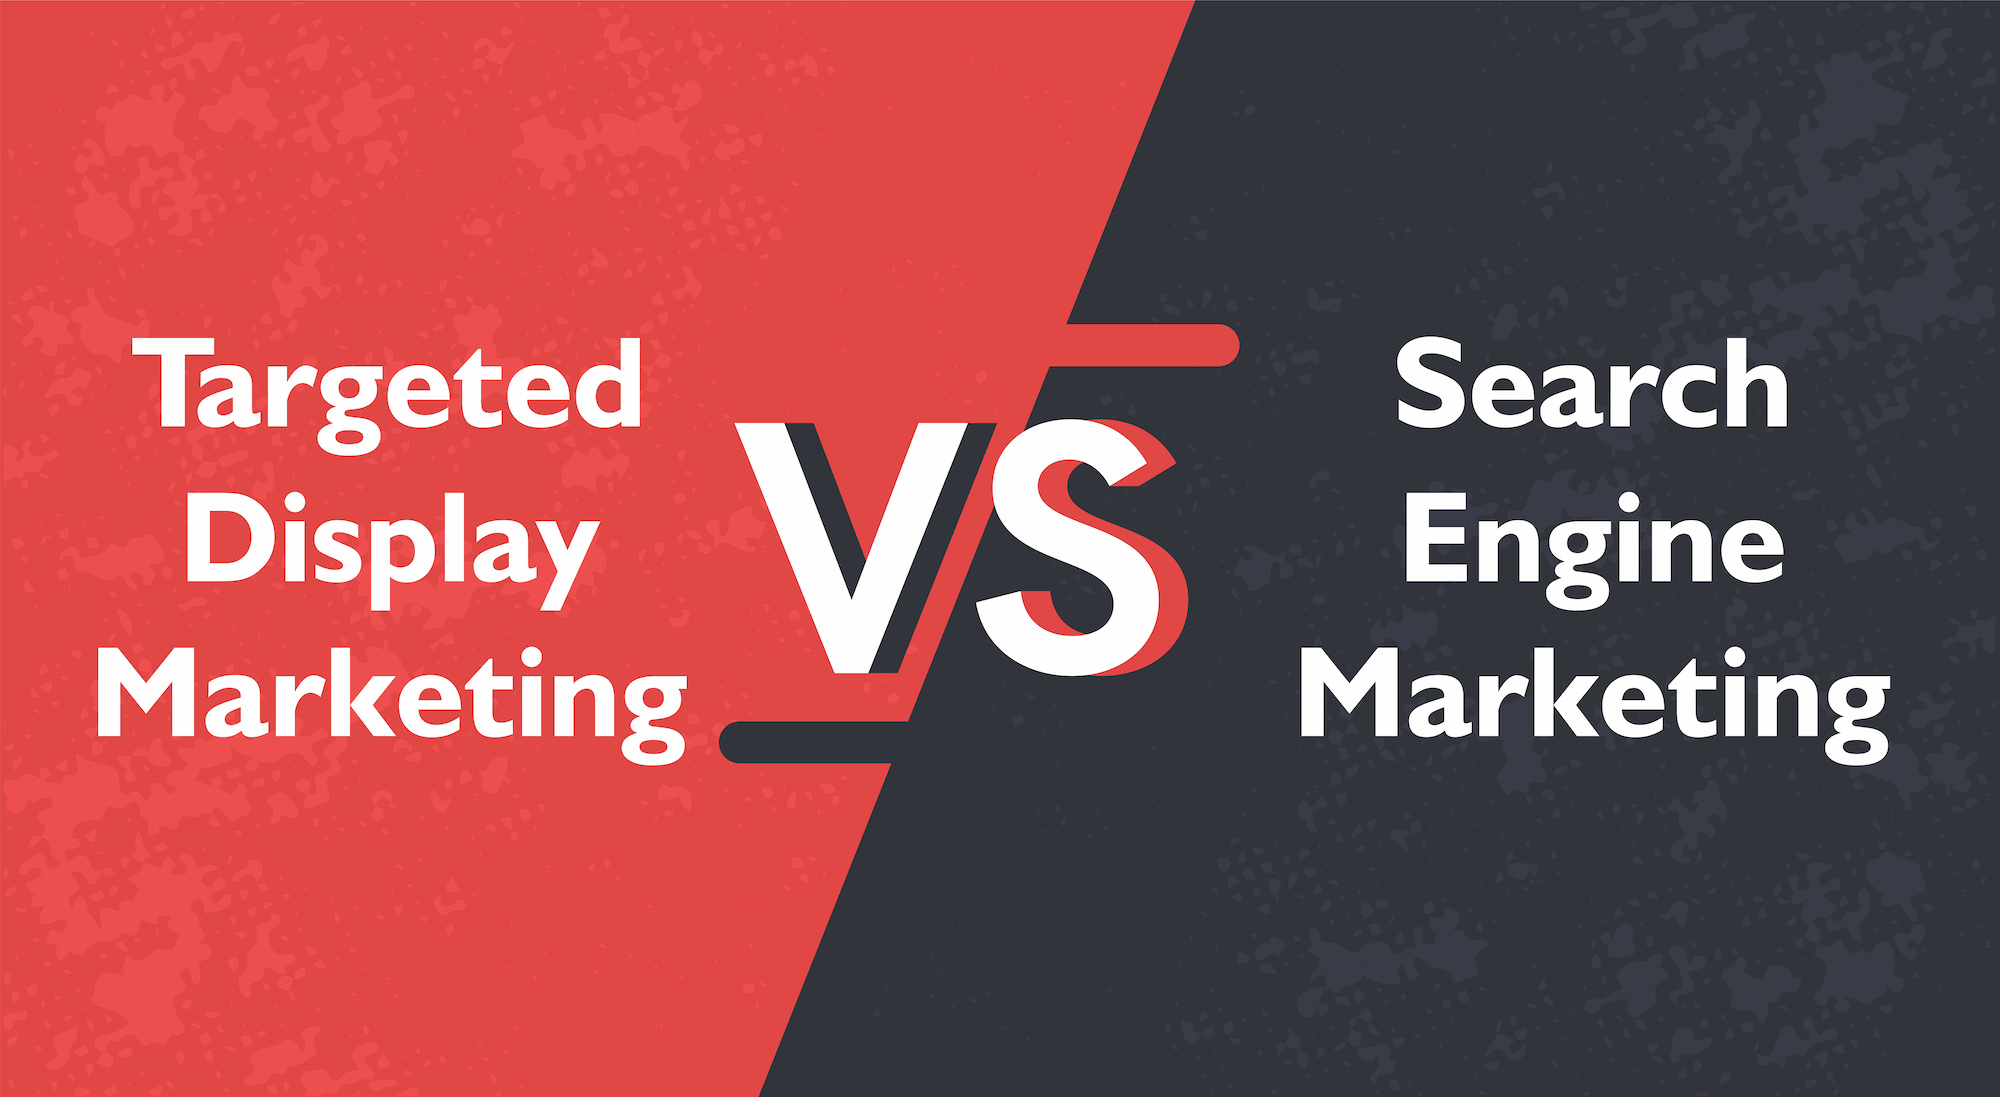 Targeted Display vs. Search Engine Marketing (SEM)